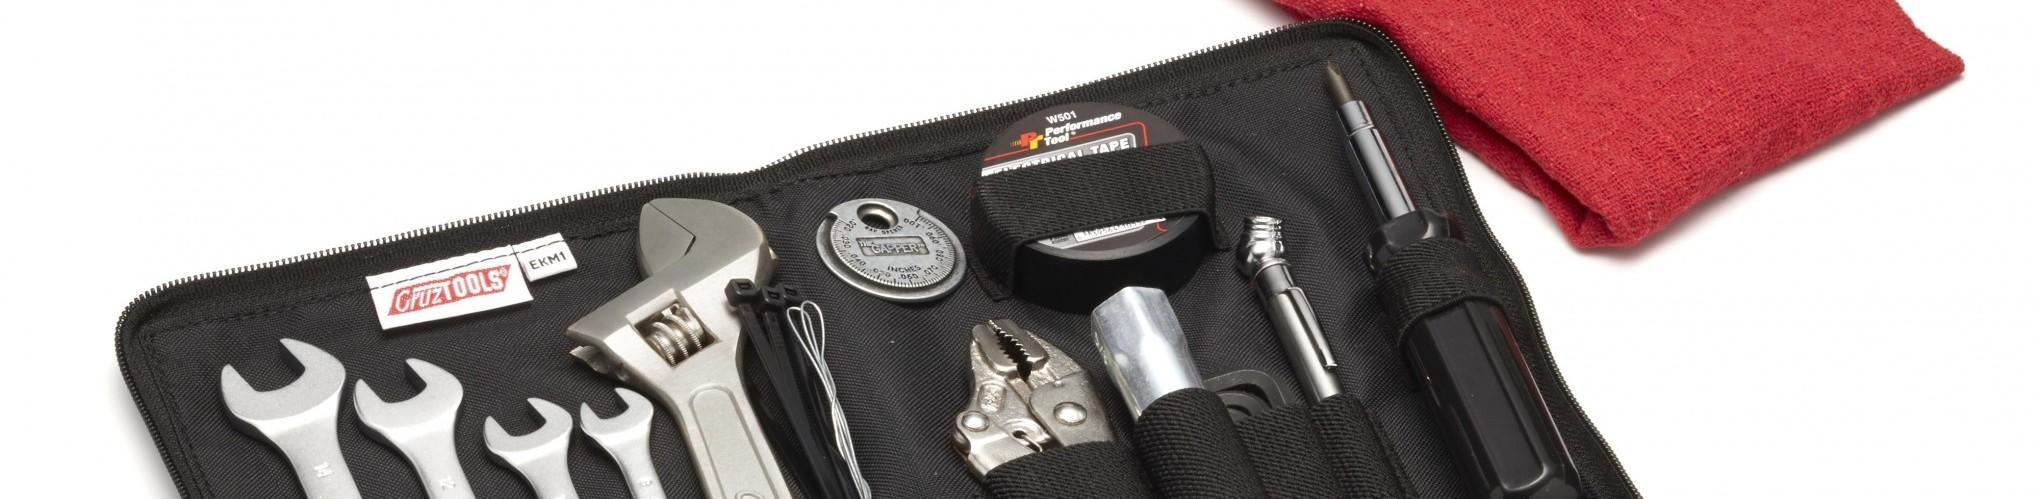 Motor accessoires | MotorCentrumWest